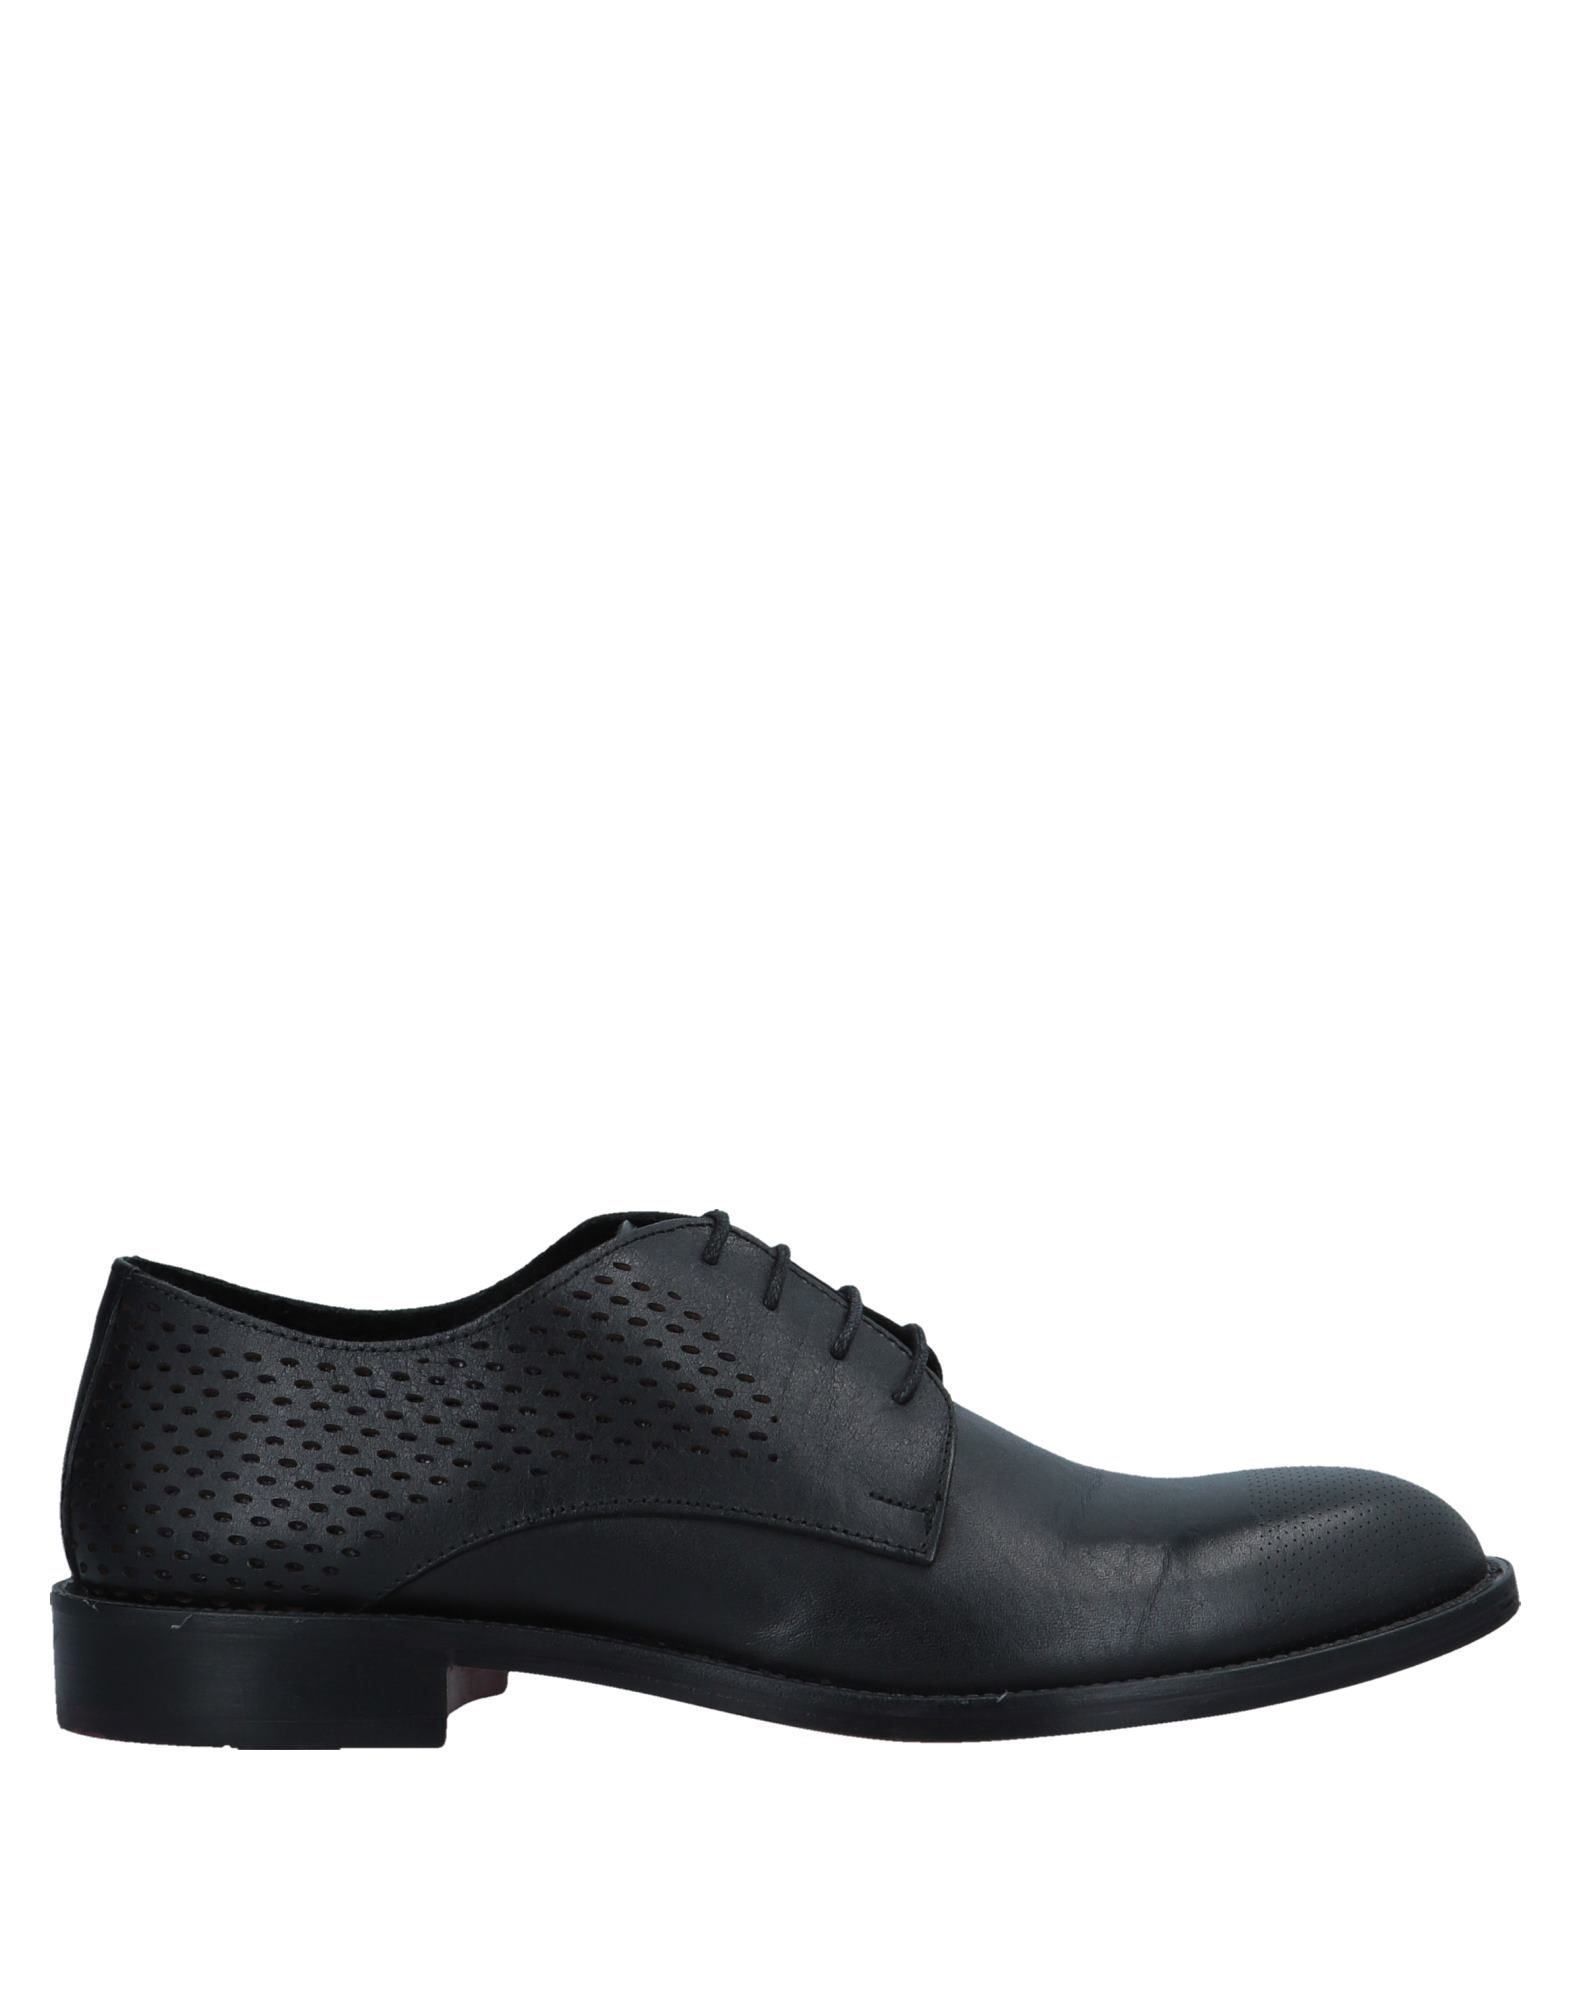 HERMAN & SONS Обувь на шнурках подтяжки herman арт trigger w17010 черный